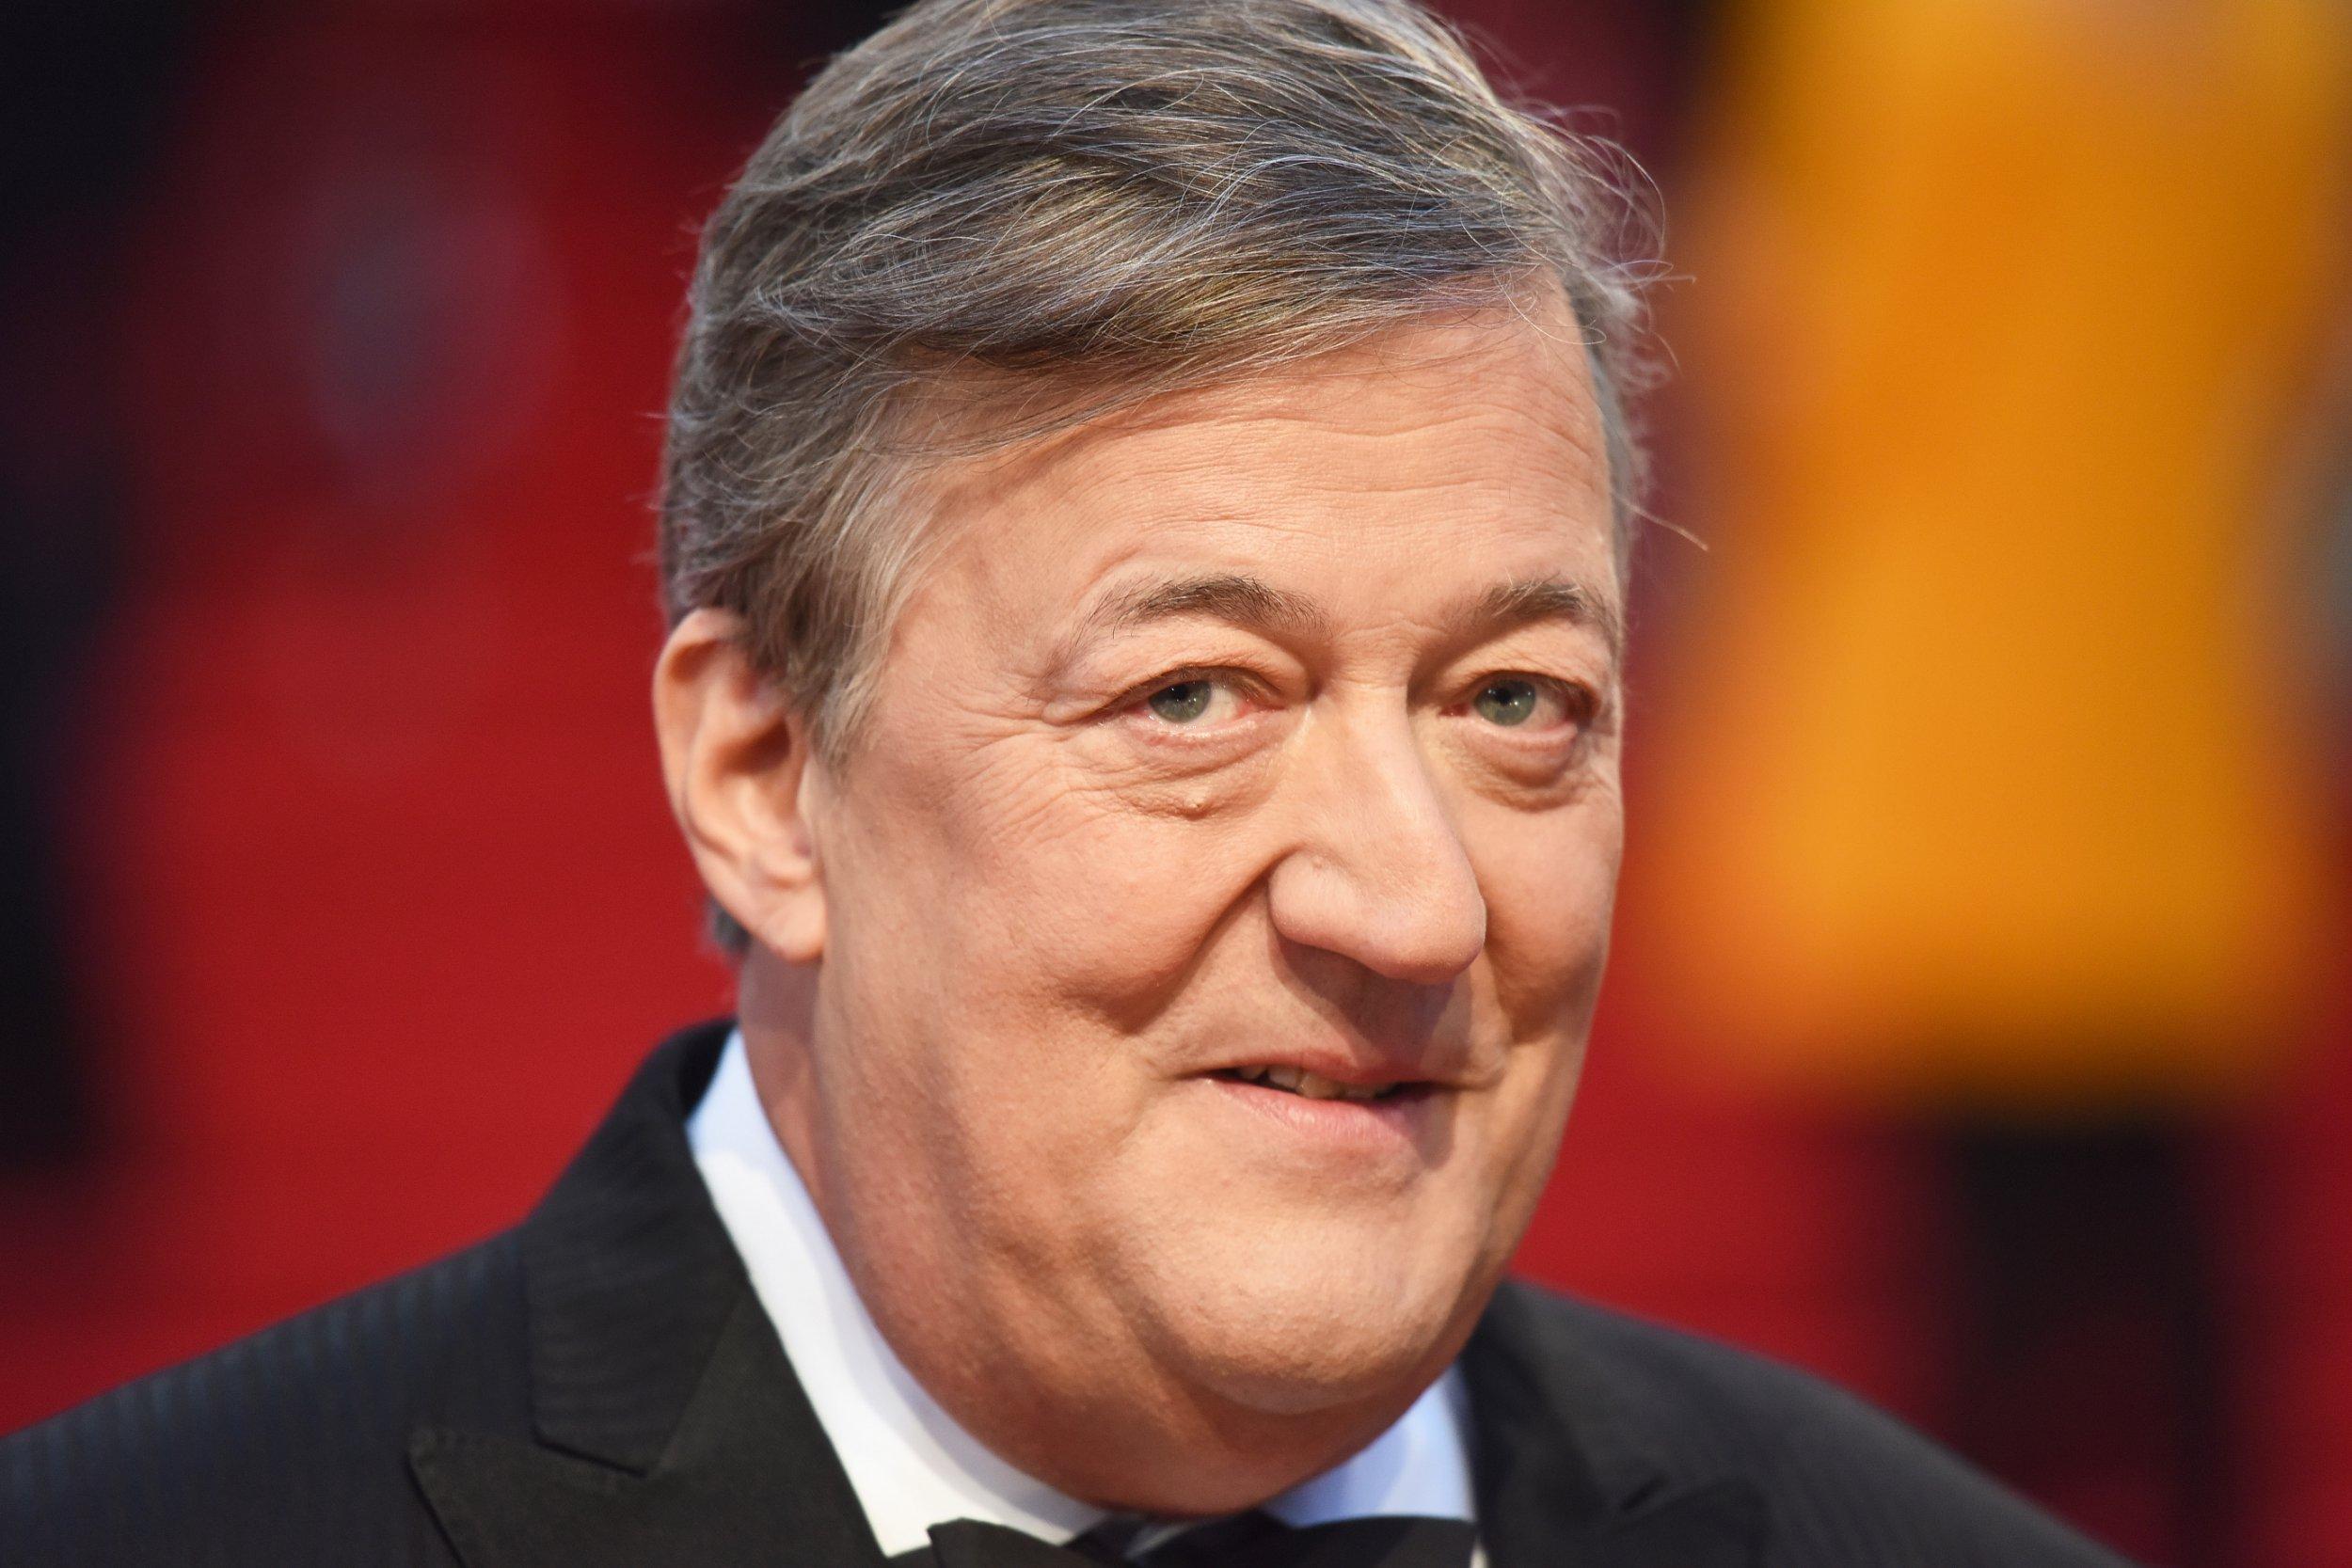 Stephen Fry faces blasphemy investigation after calling God an 'utter maniac'